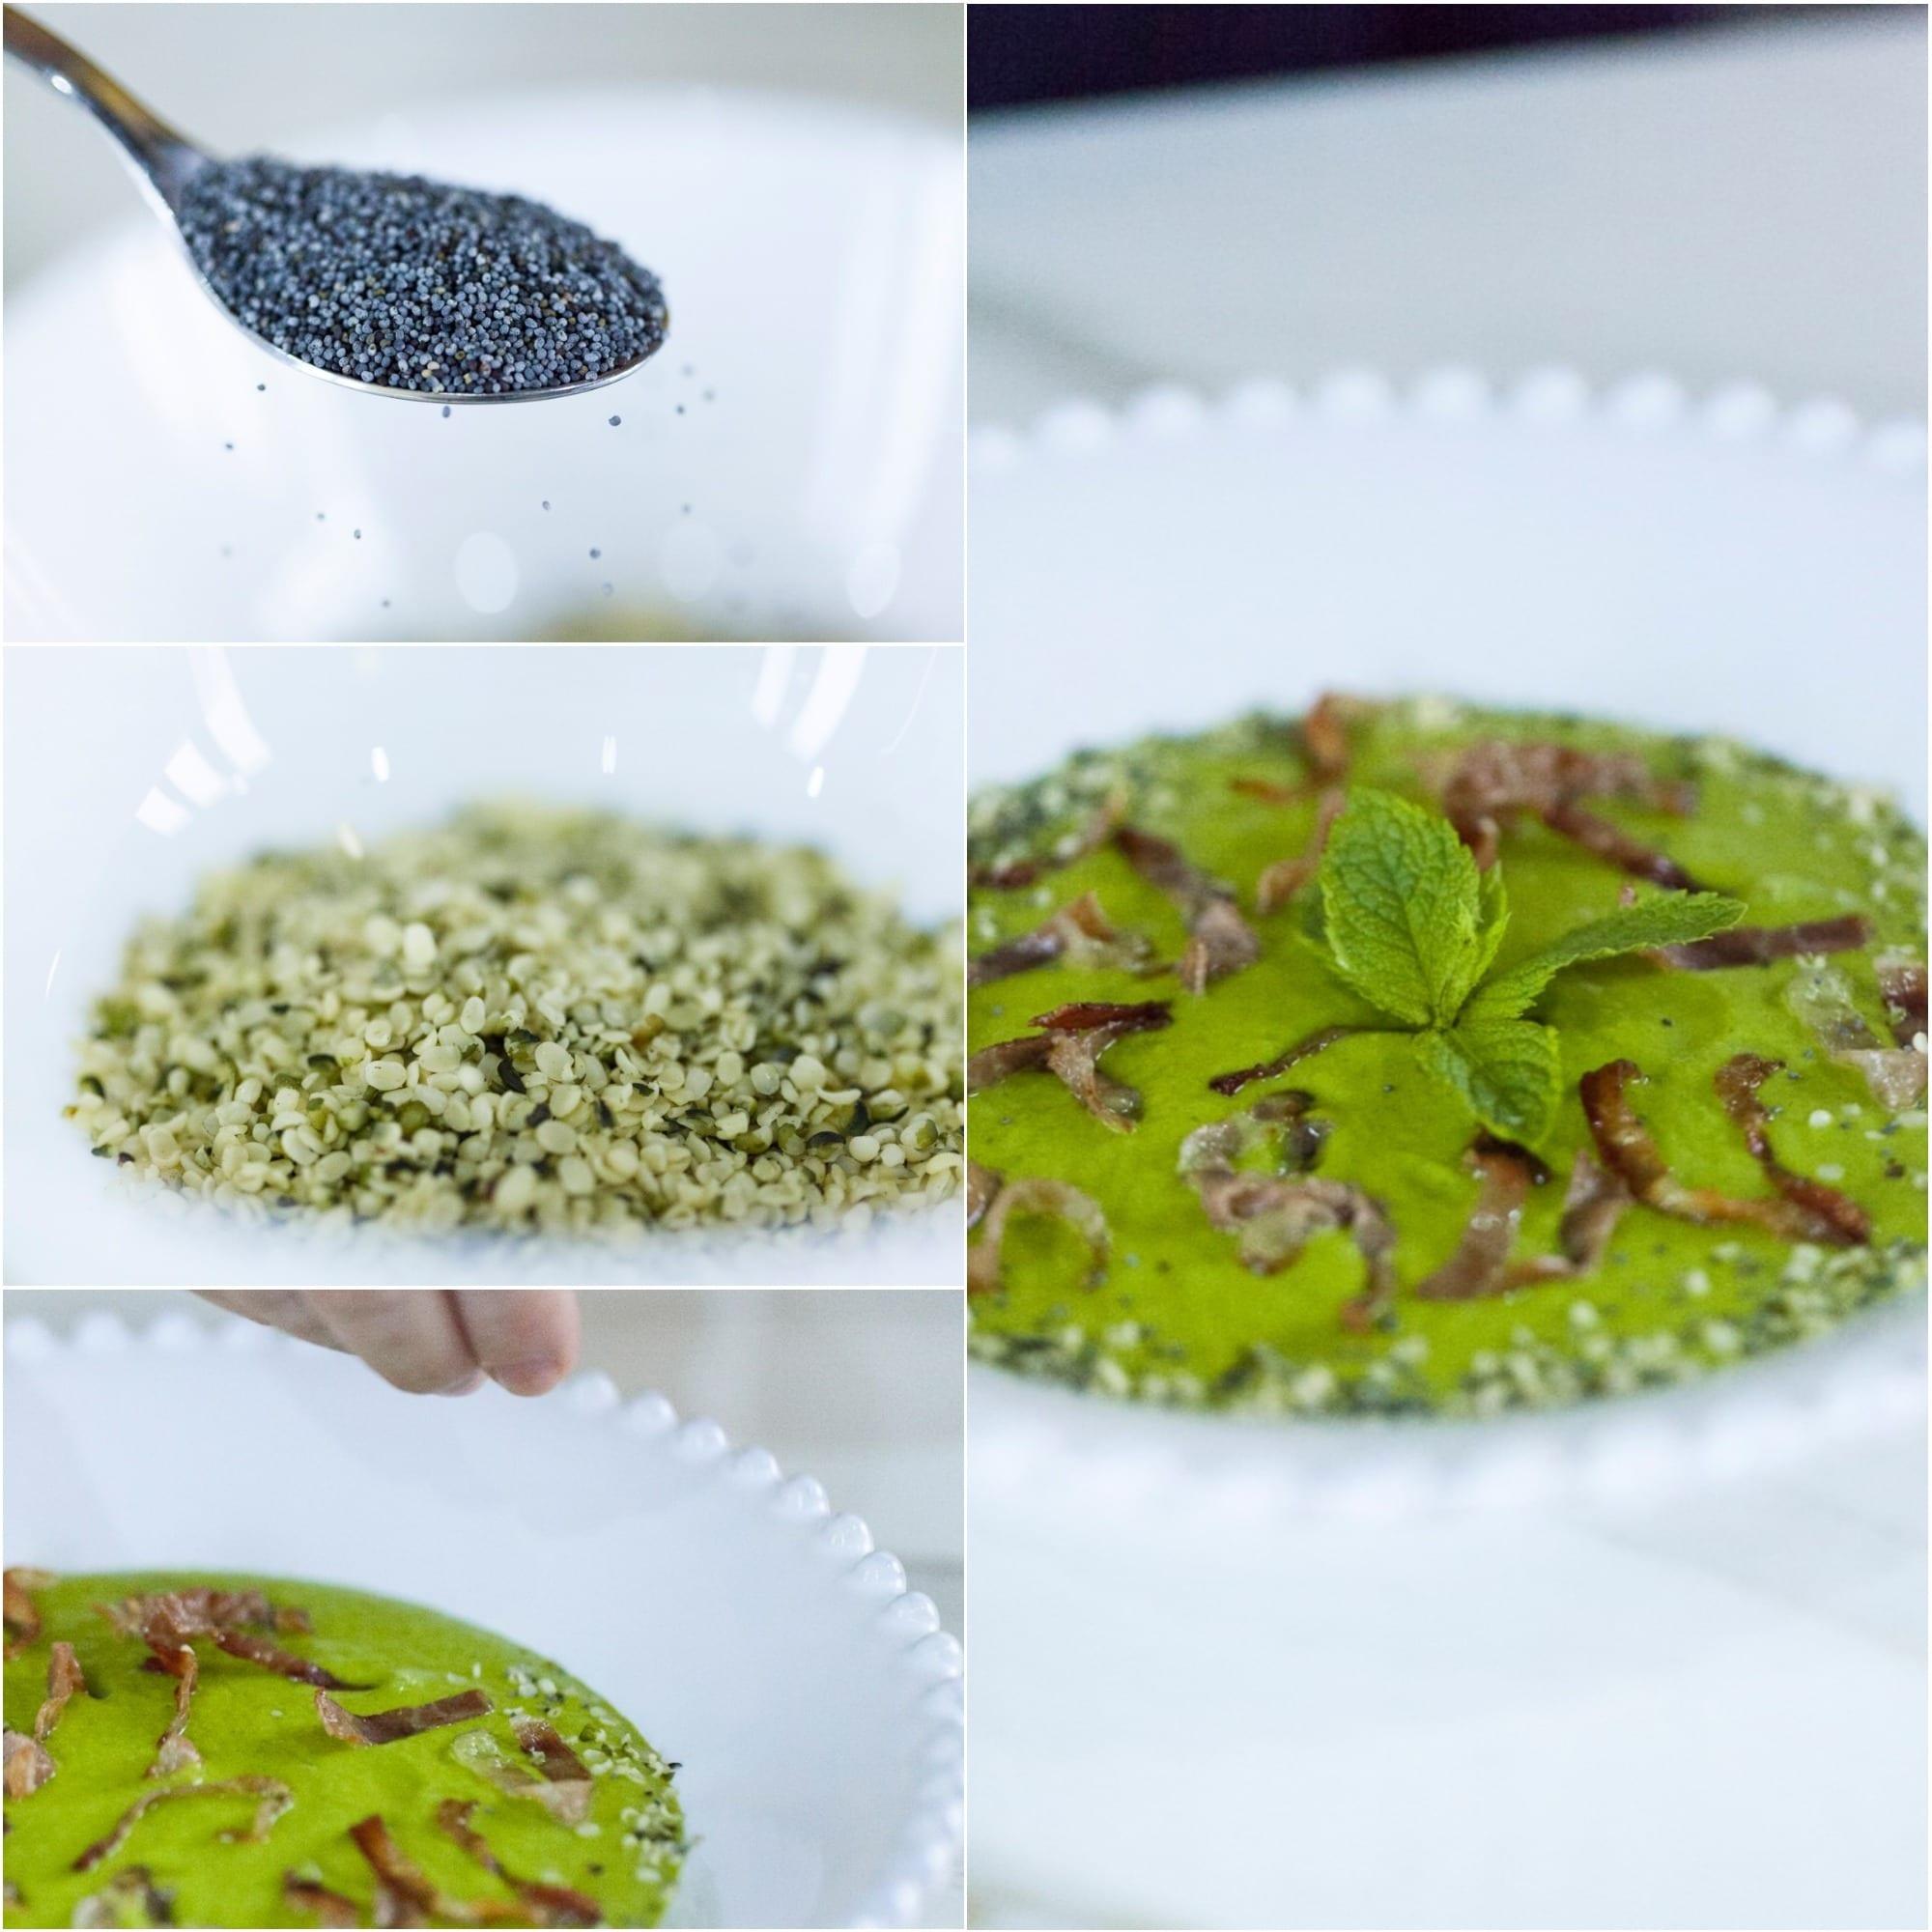 Crema di zucchine e menta